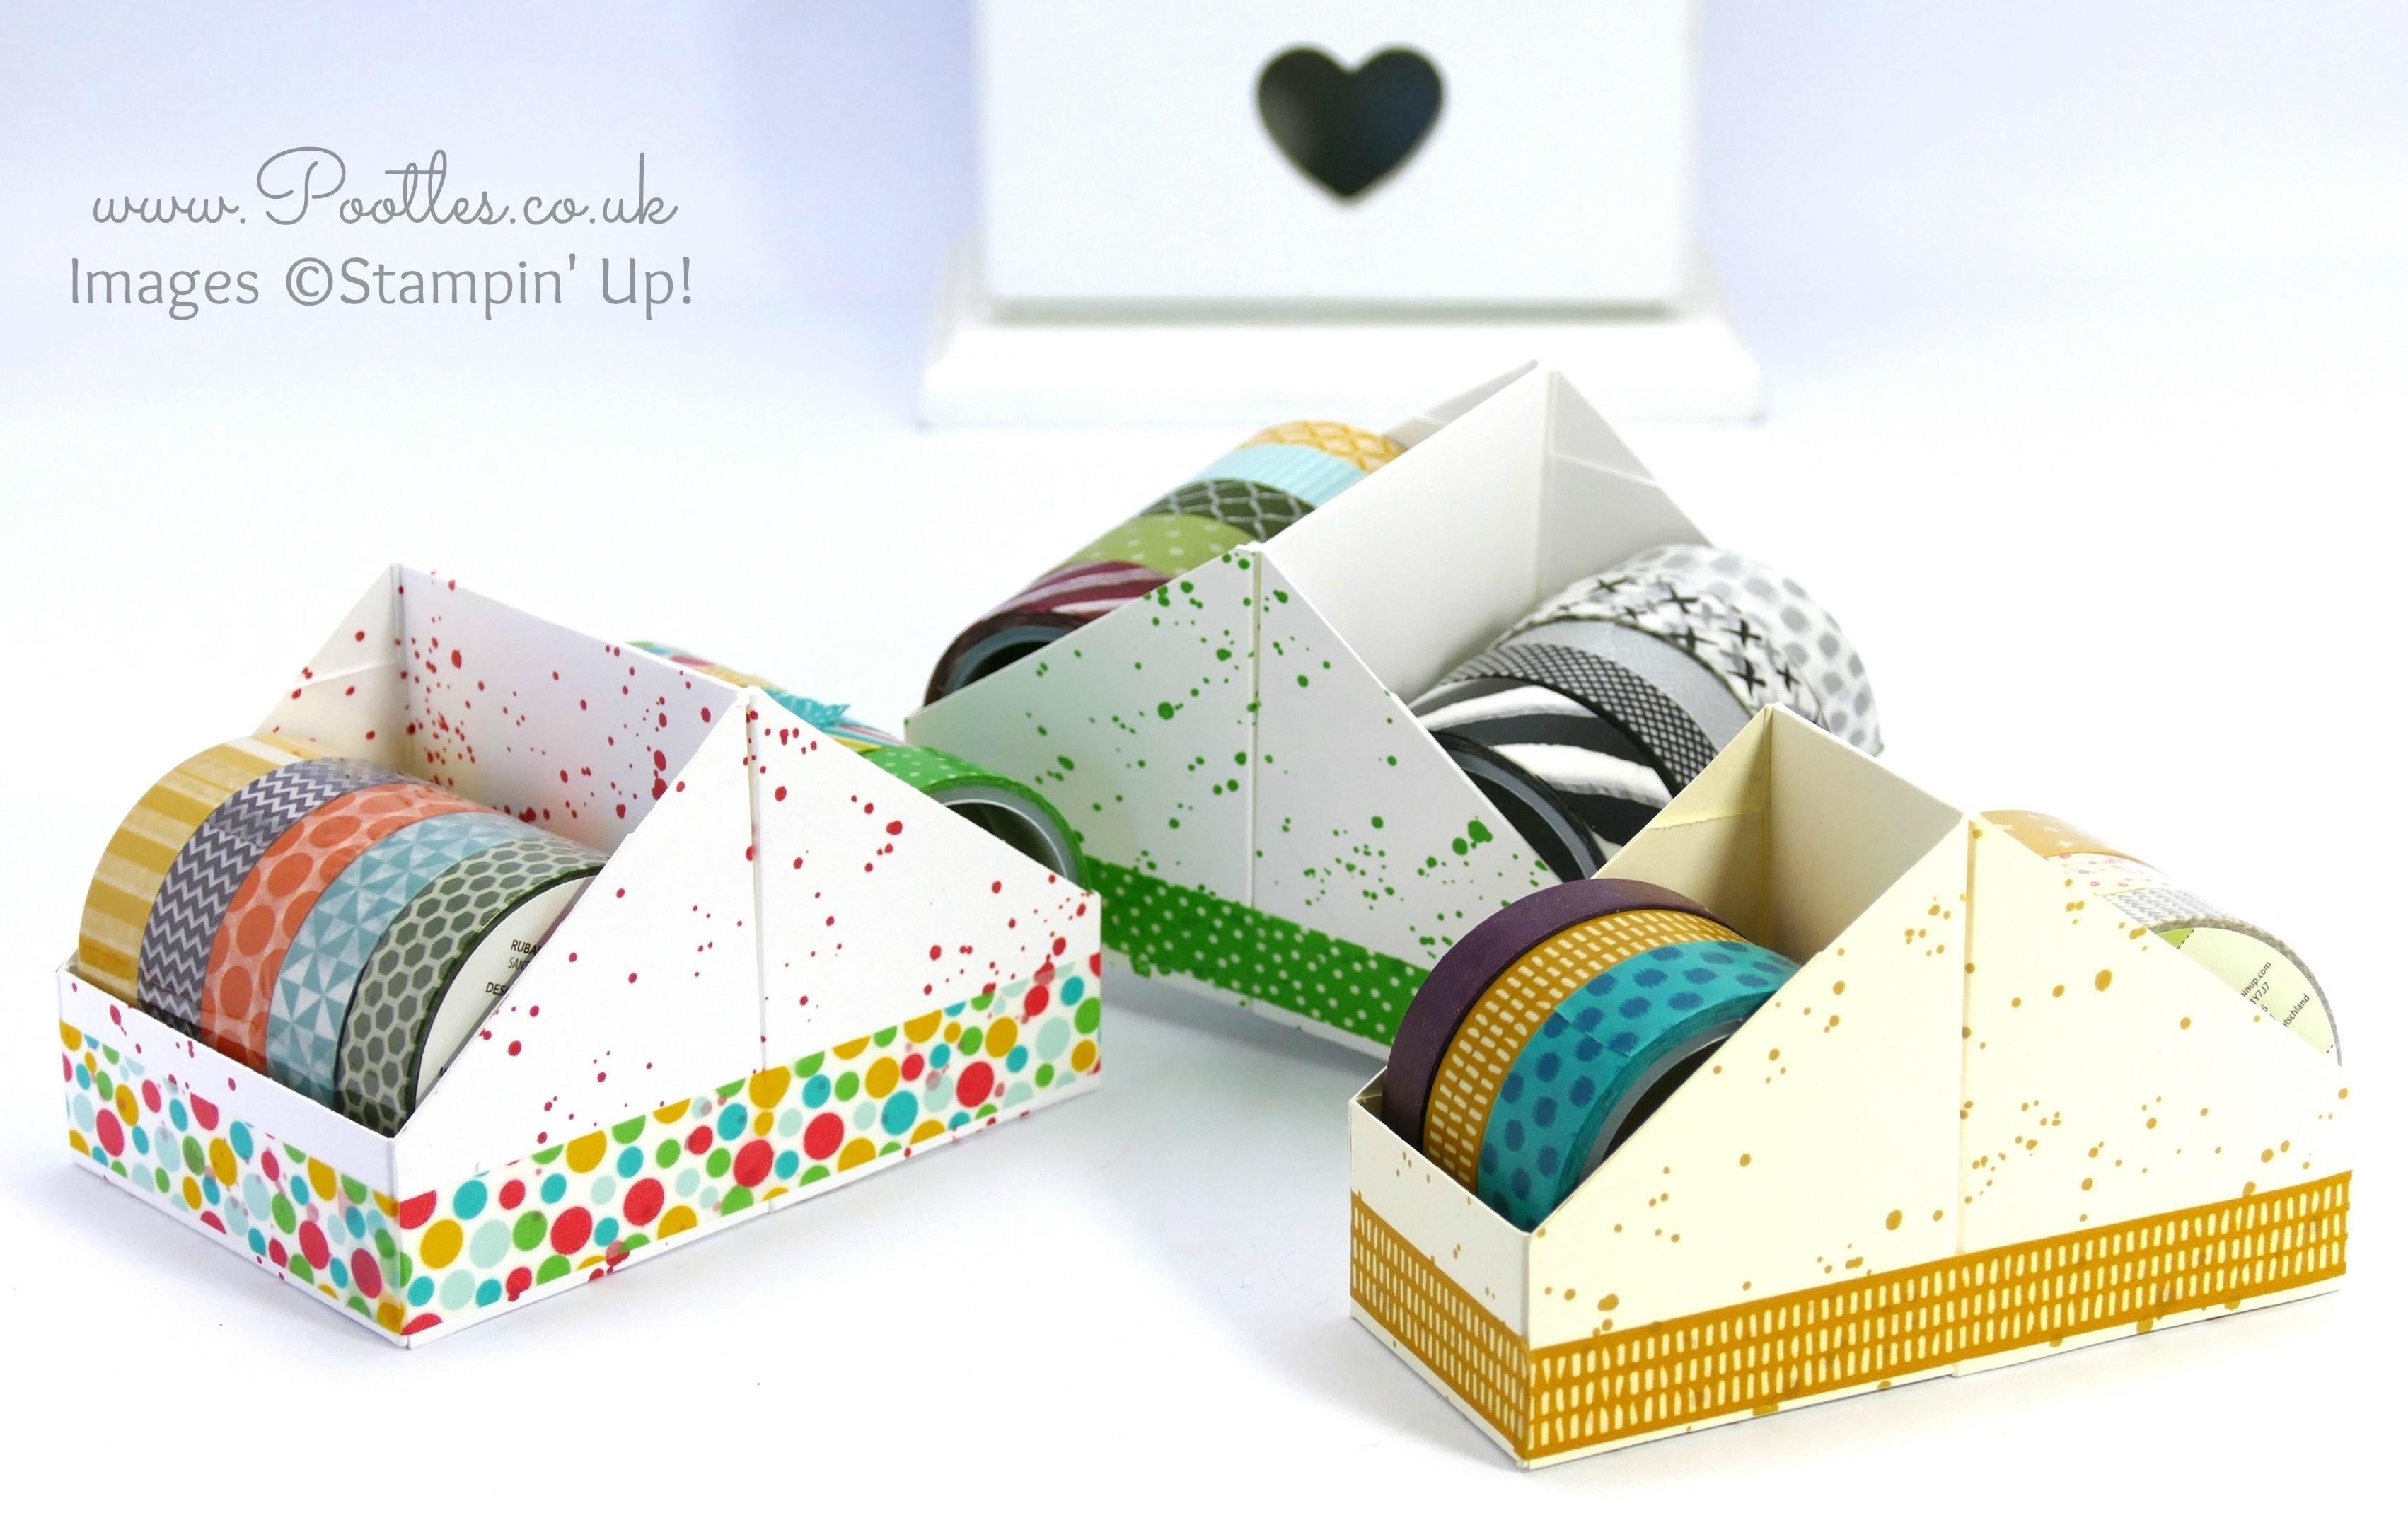 Washi Tape Holder Tutorial using Stampin' Up! Supplies